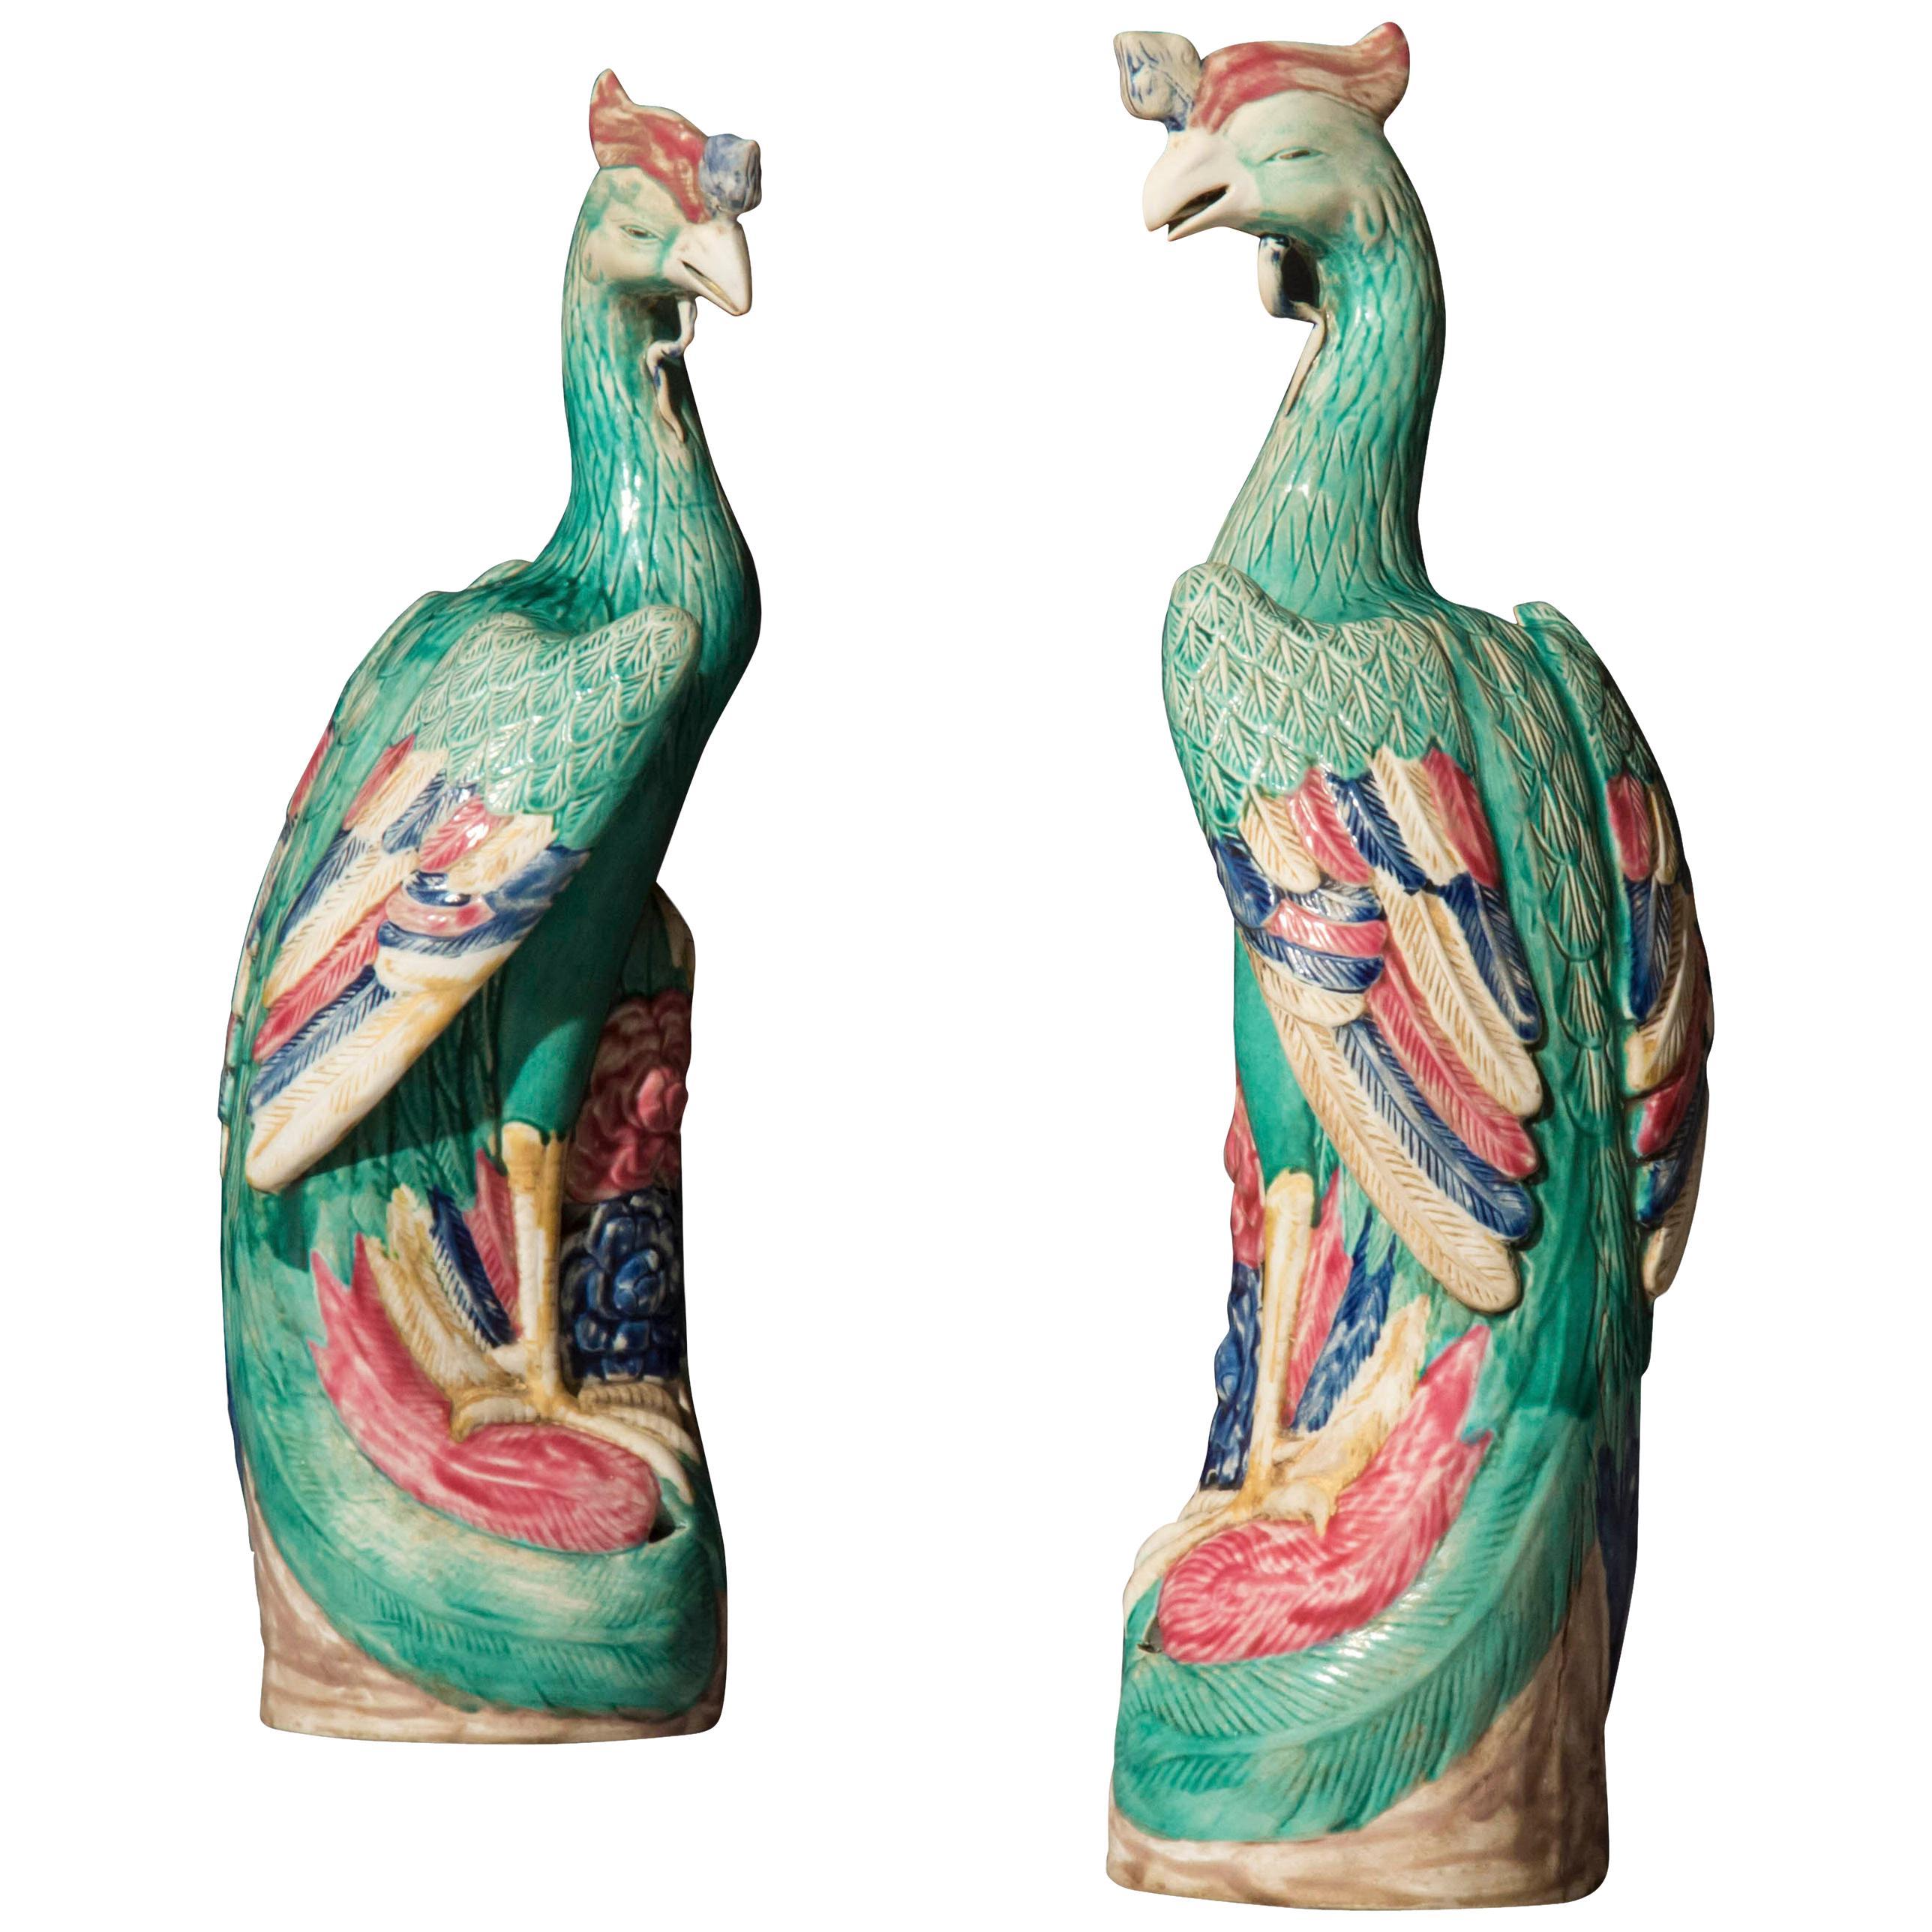 Large Pair of Chinese Porcelain Phoenix Bird Figurines